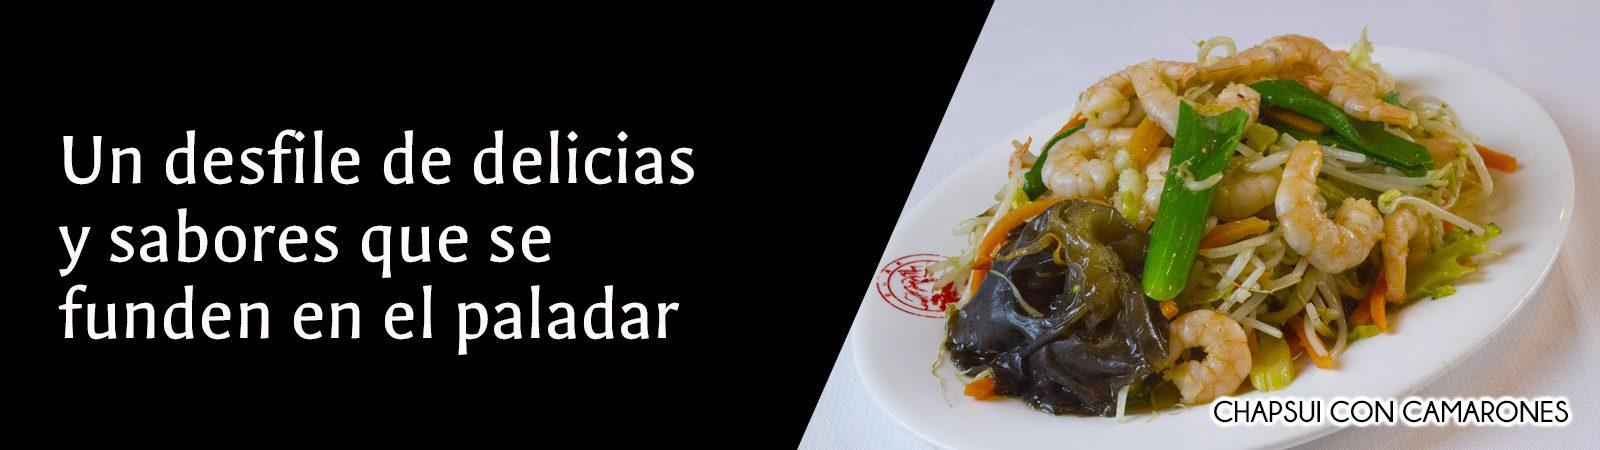 07-parquechina-menu-VERDURAS